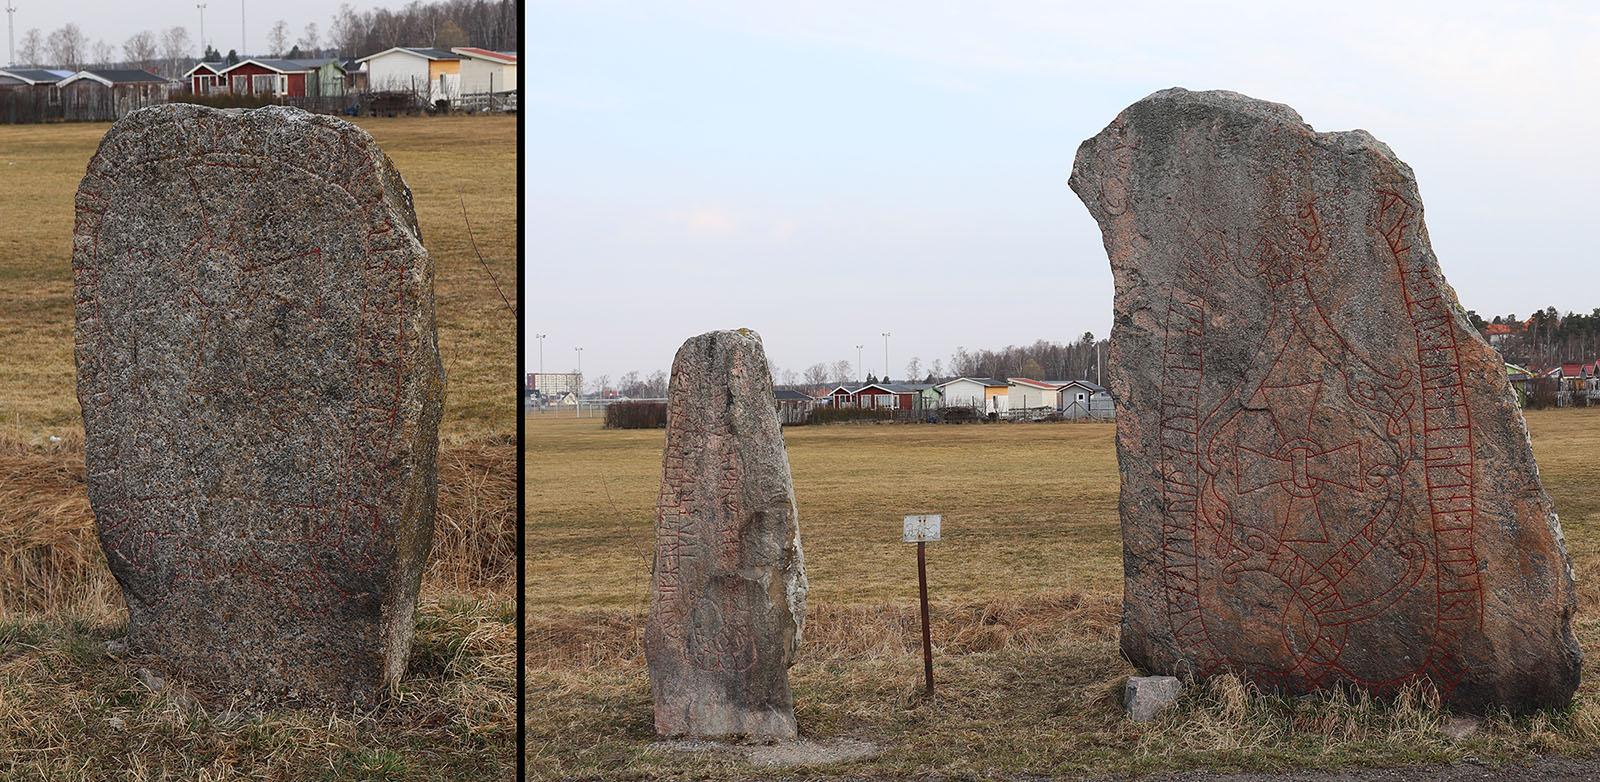 04-09 ad Runetones Sö 107-109